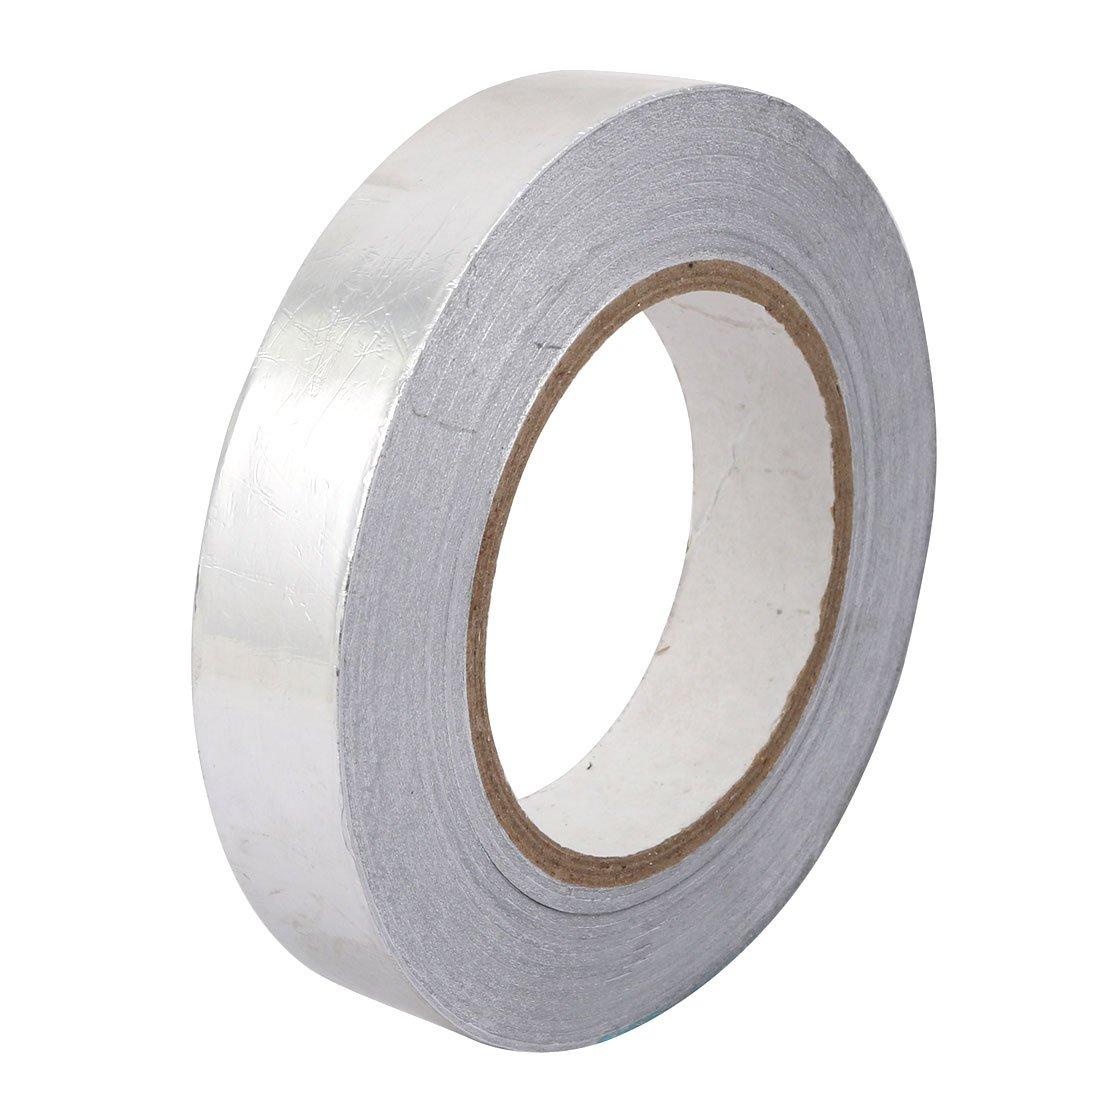 uxcell 25mm Width Anti-Radiation Aluminum Foil Tape Shield Duct Repair 50 Meters Length